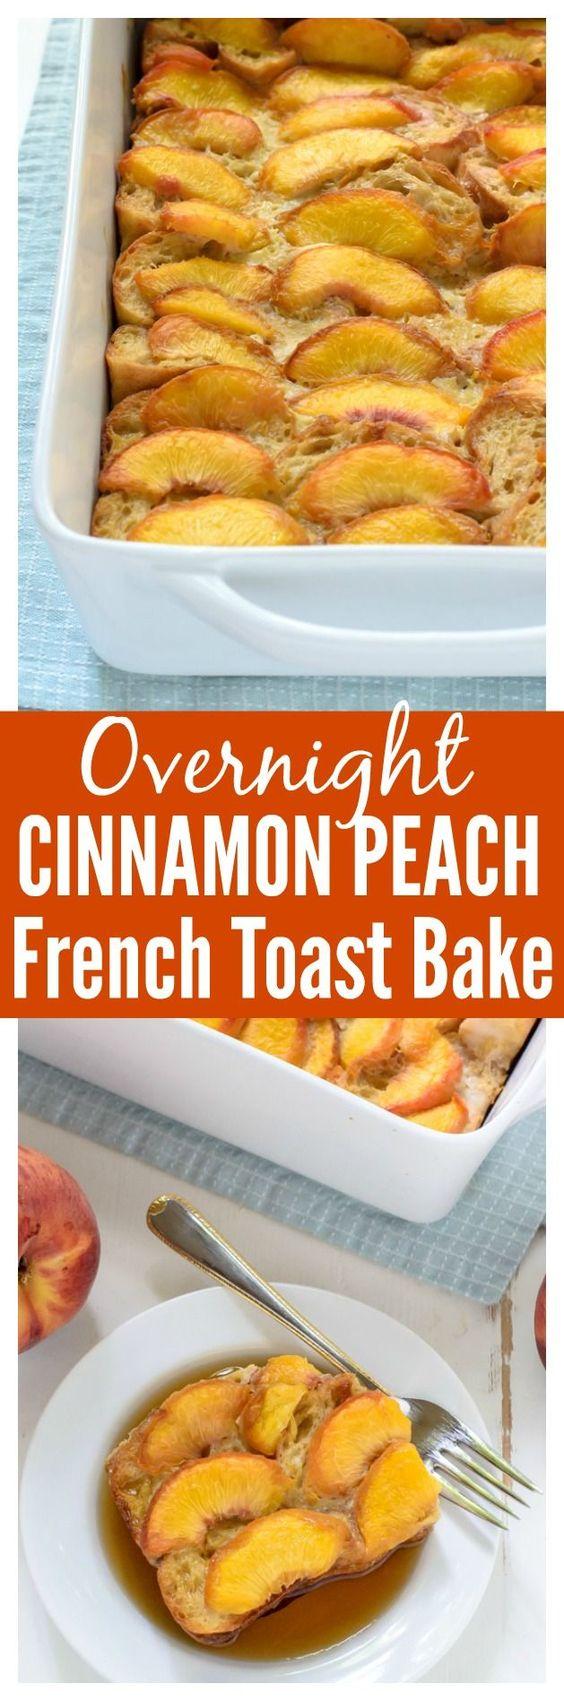 Overnight Cinnamon Peach French Toast Bake. Fun and easy breakfast ...